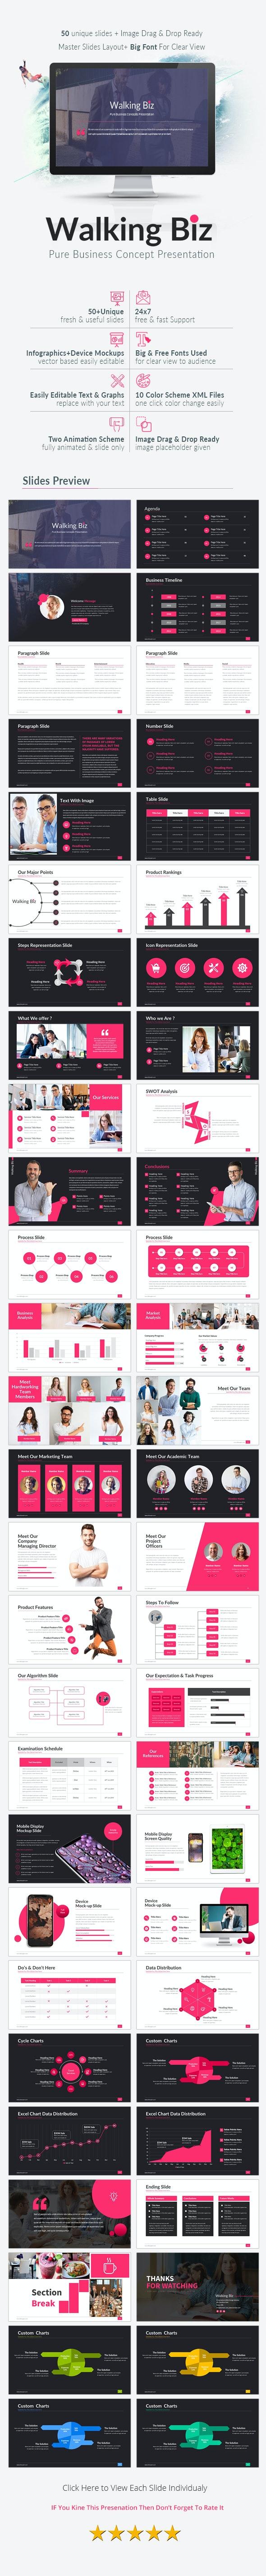 Walking Biz Power Point Template - Business PowerPoint Templates